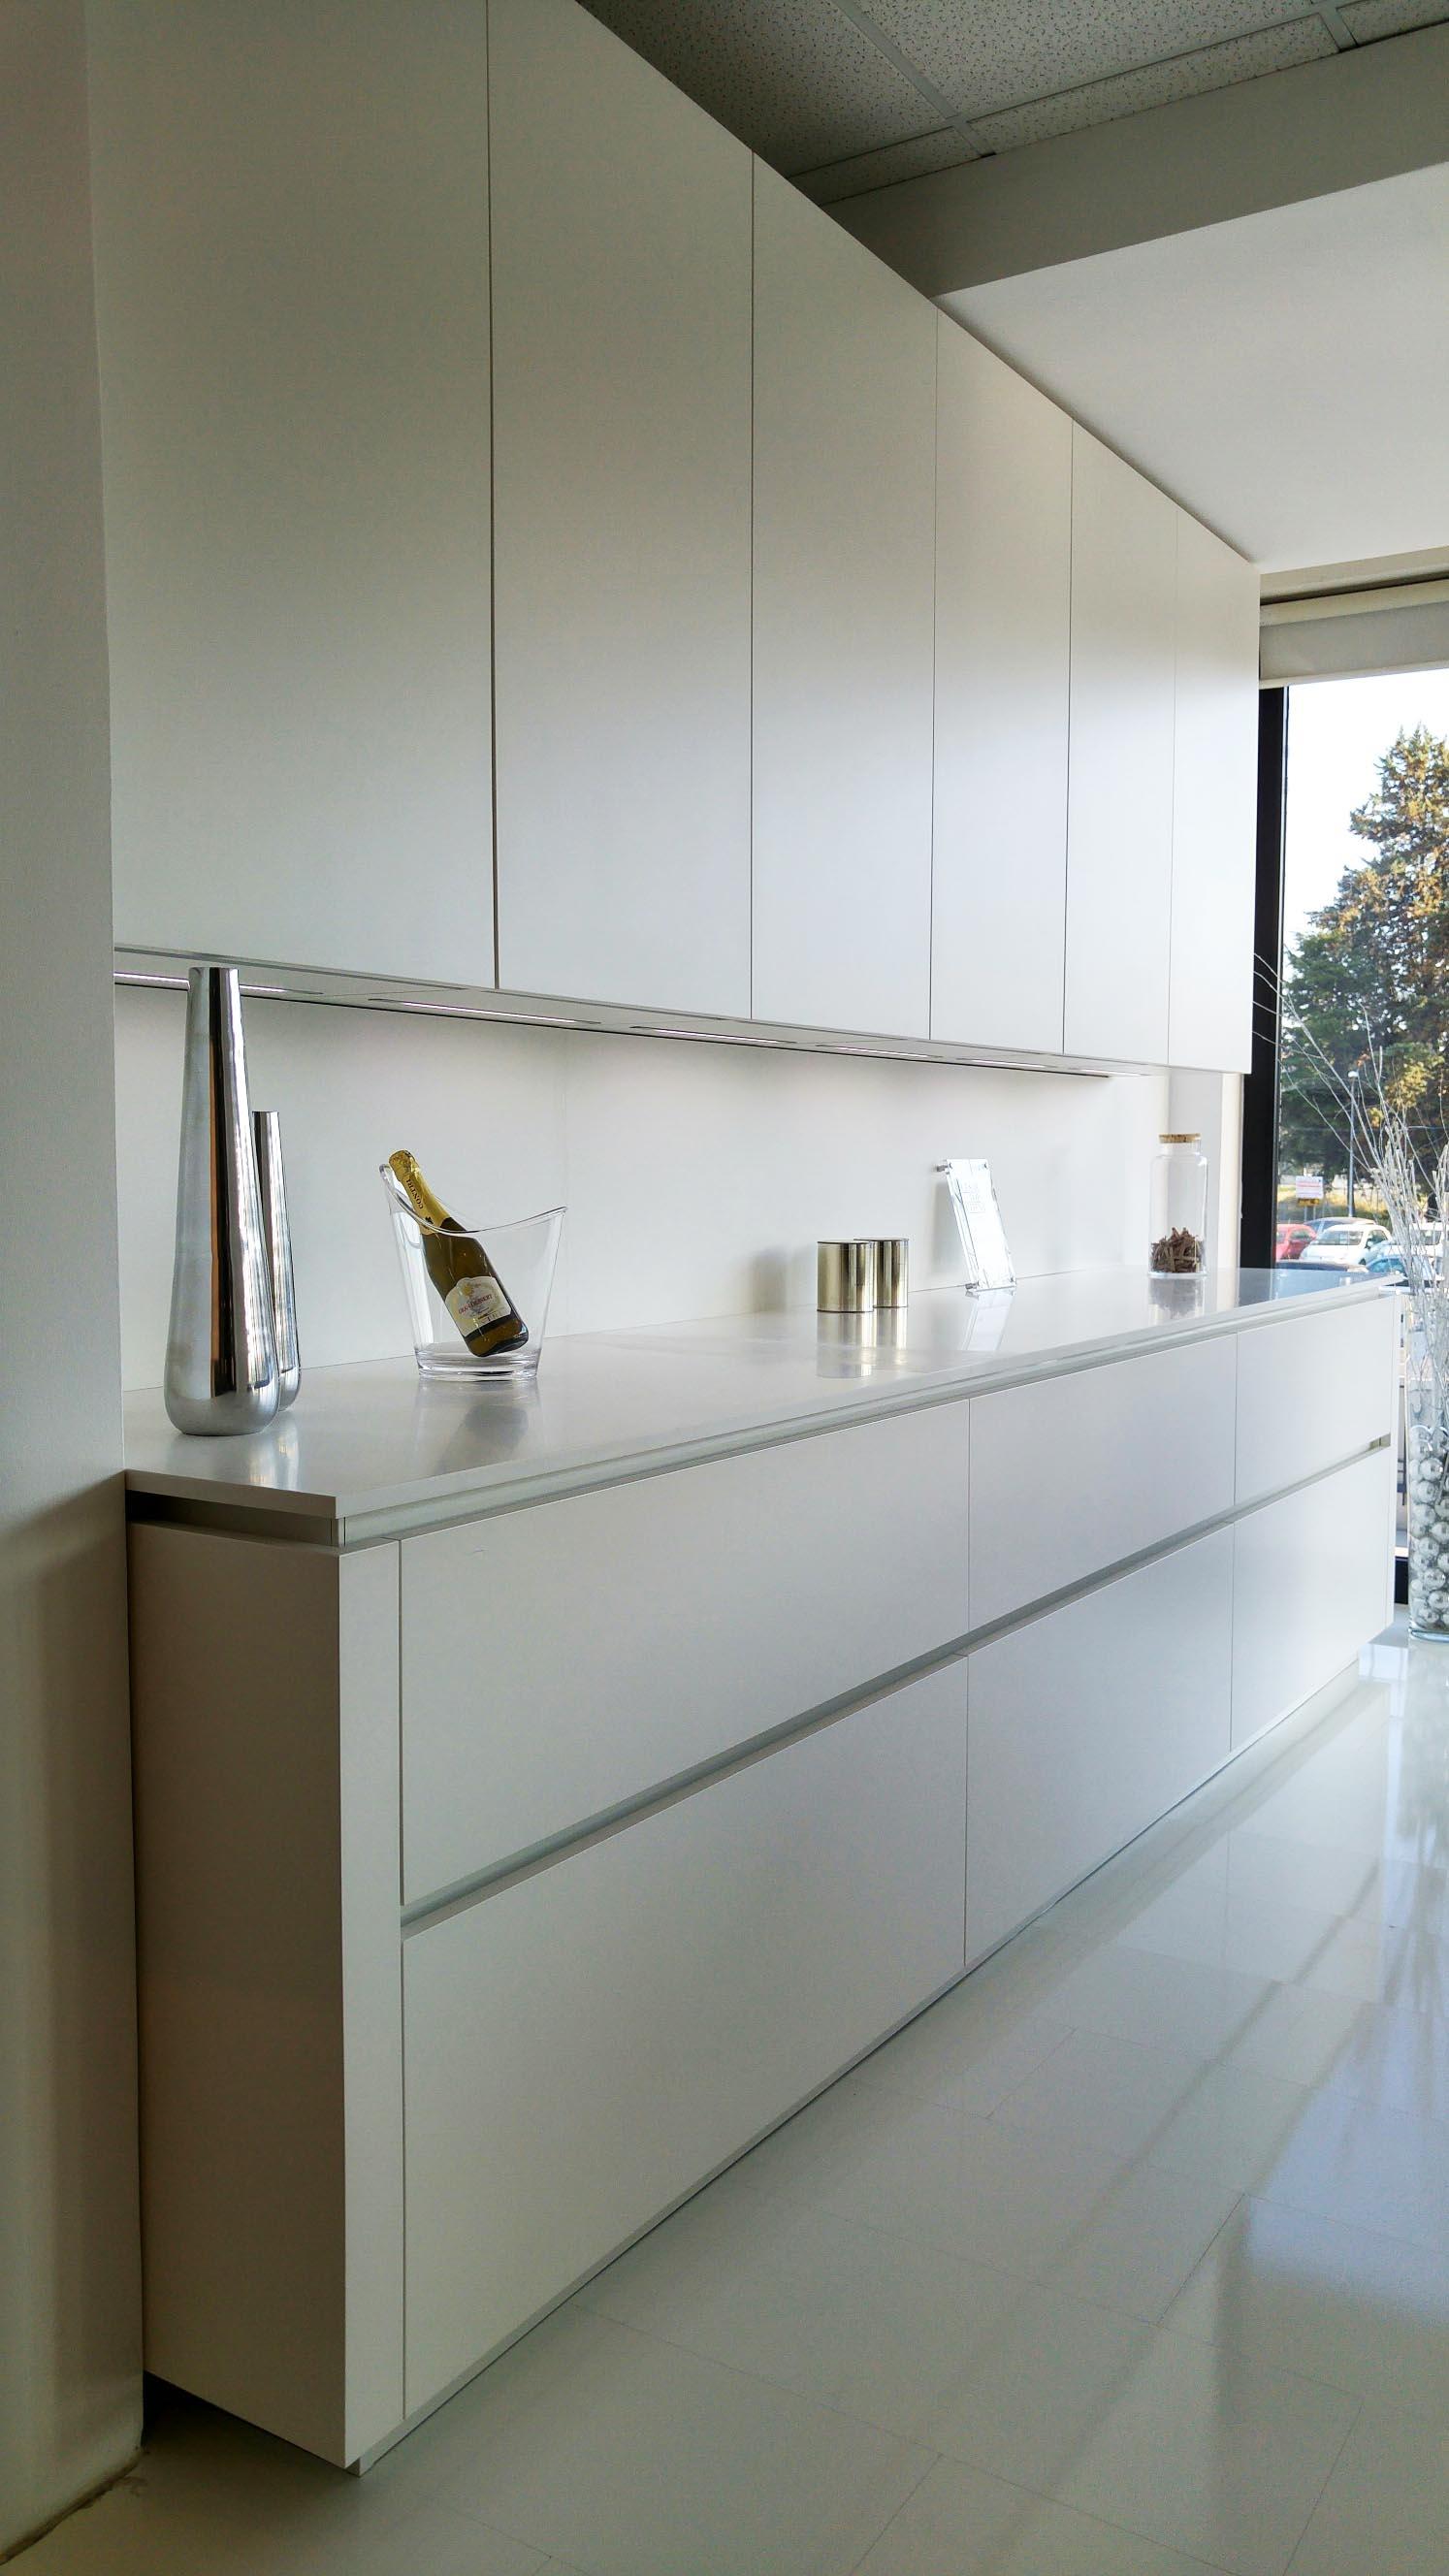 Cucina cesar cucine yara design laccato bianca cucine a prezzi scontati - Cucine cesar prezzi ...